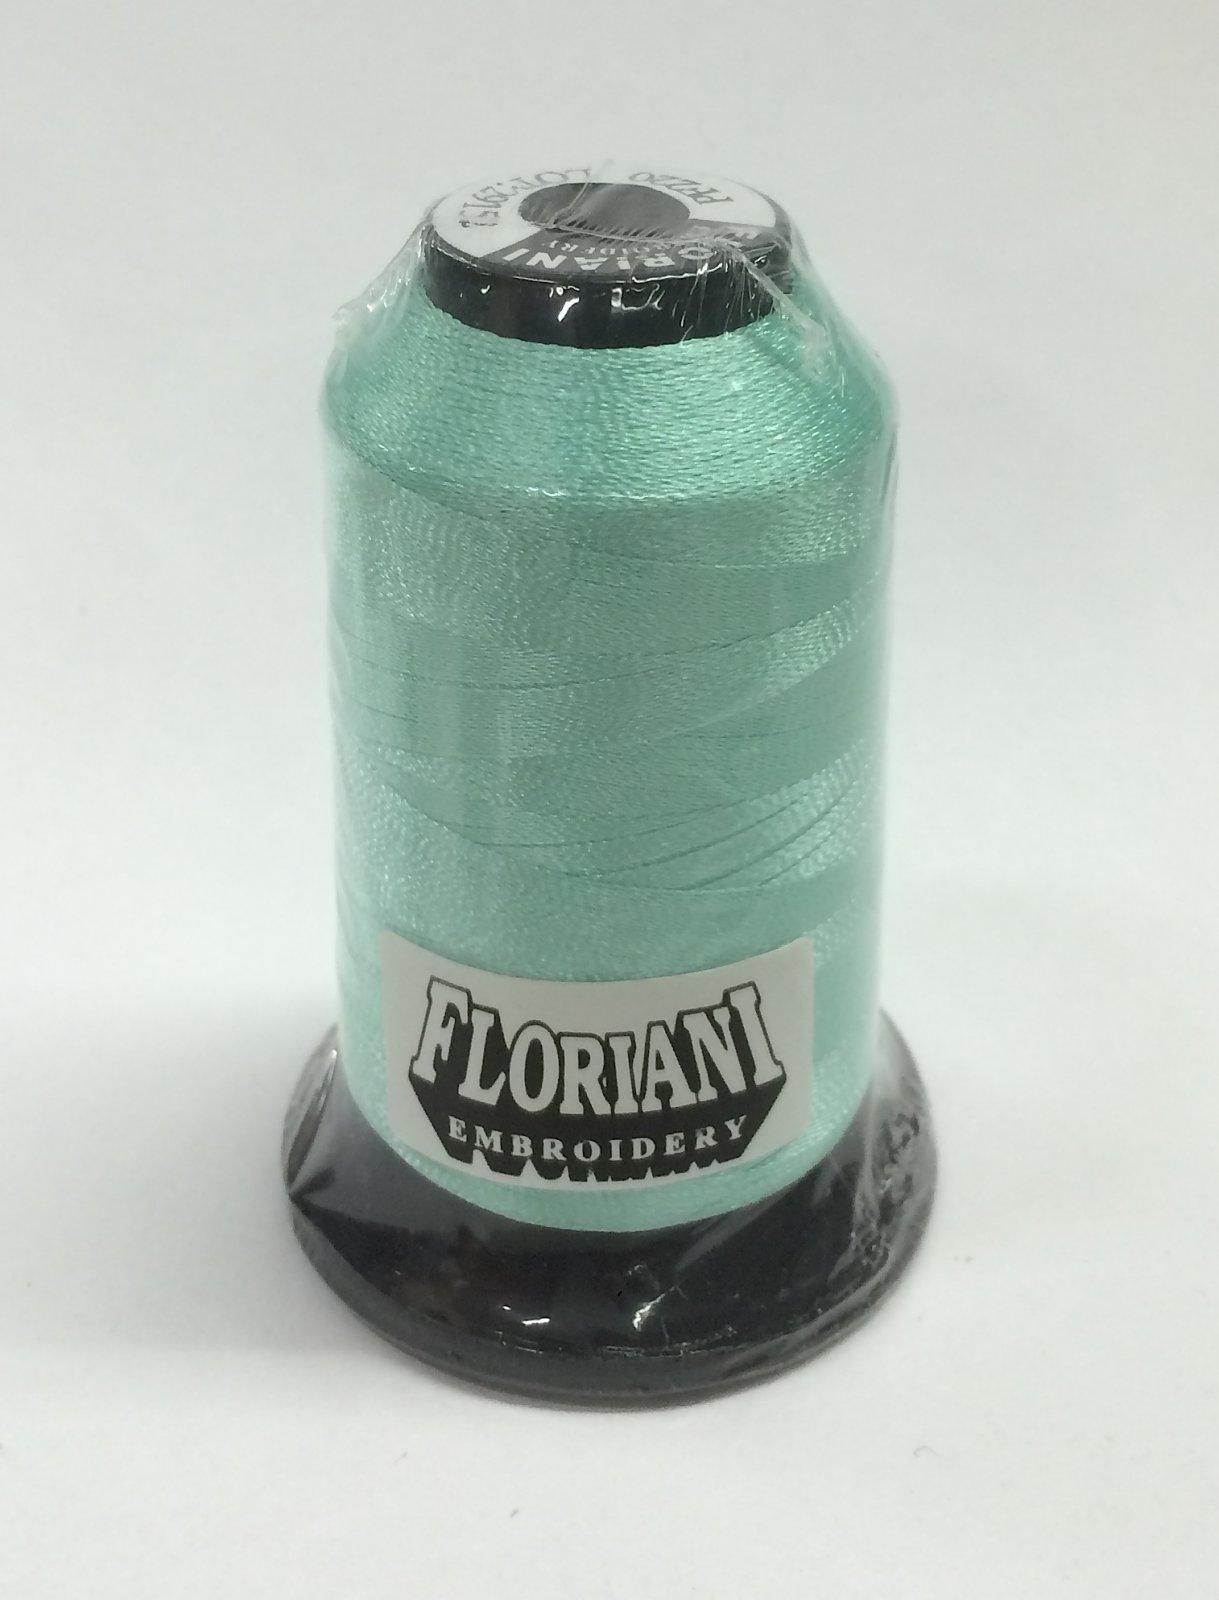 Floriani Embroidery Thread Color #0220